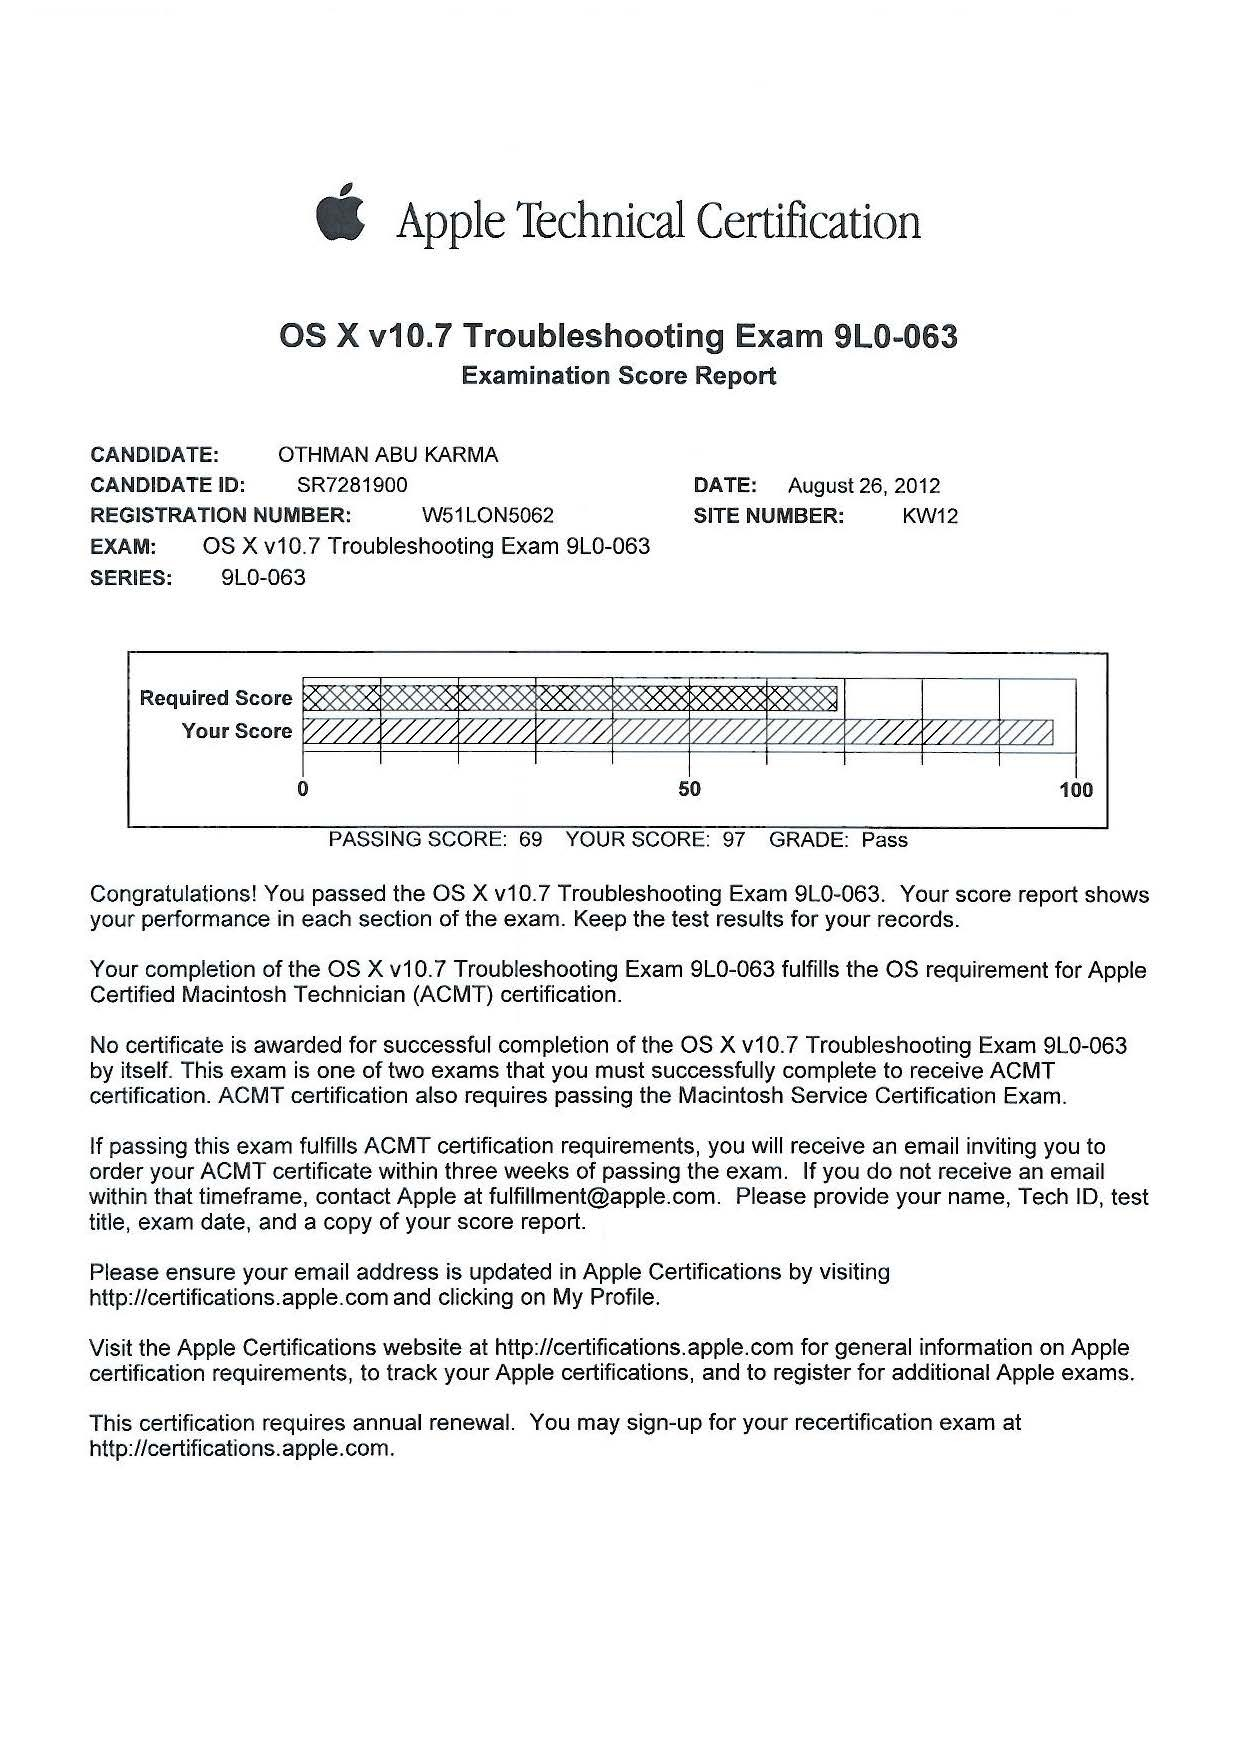 Othman abu karma bayt apple certified macintosh technician acmt certificate 1betcityfo Gallery